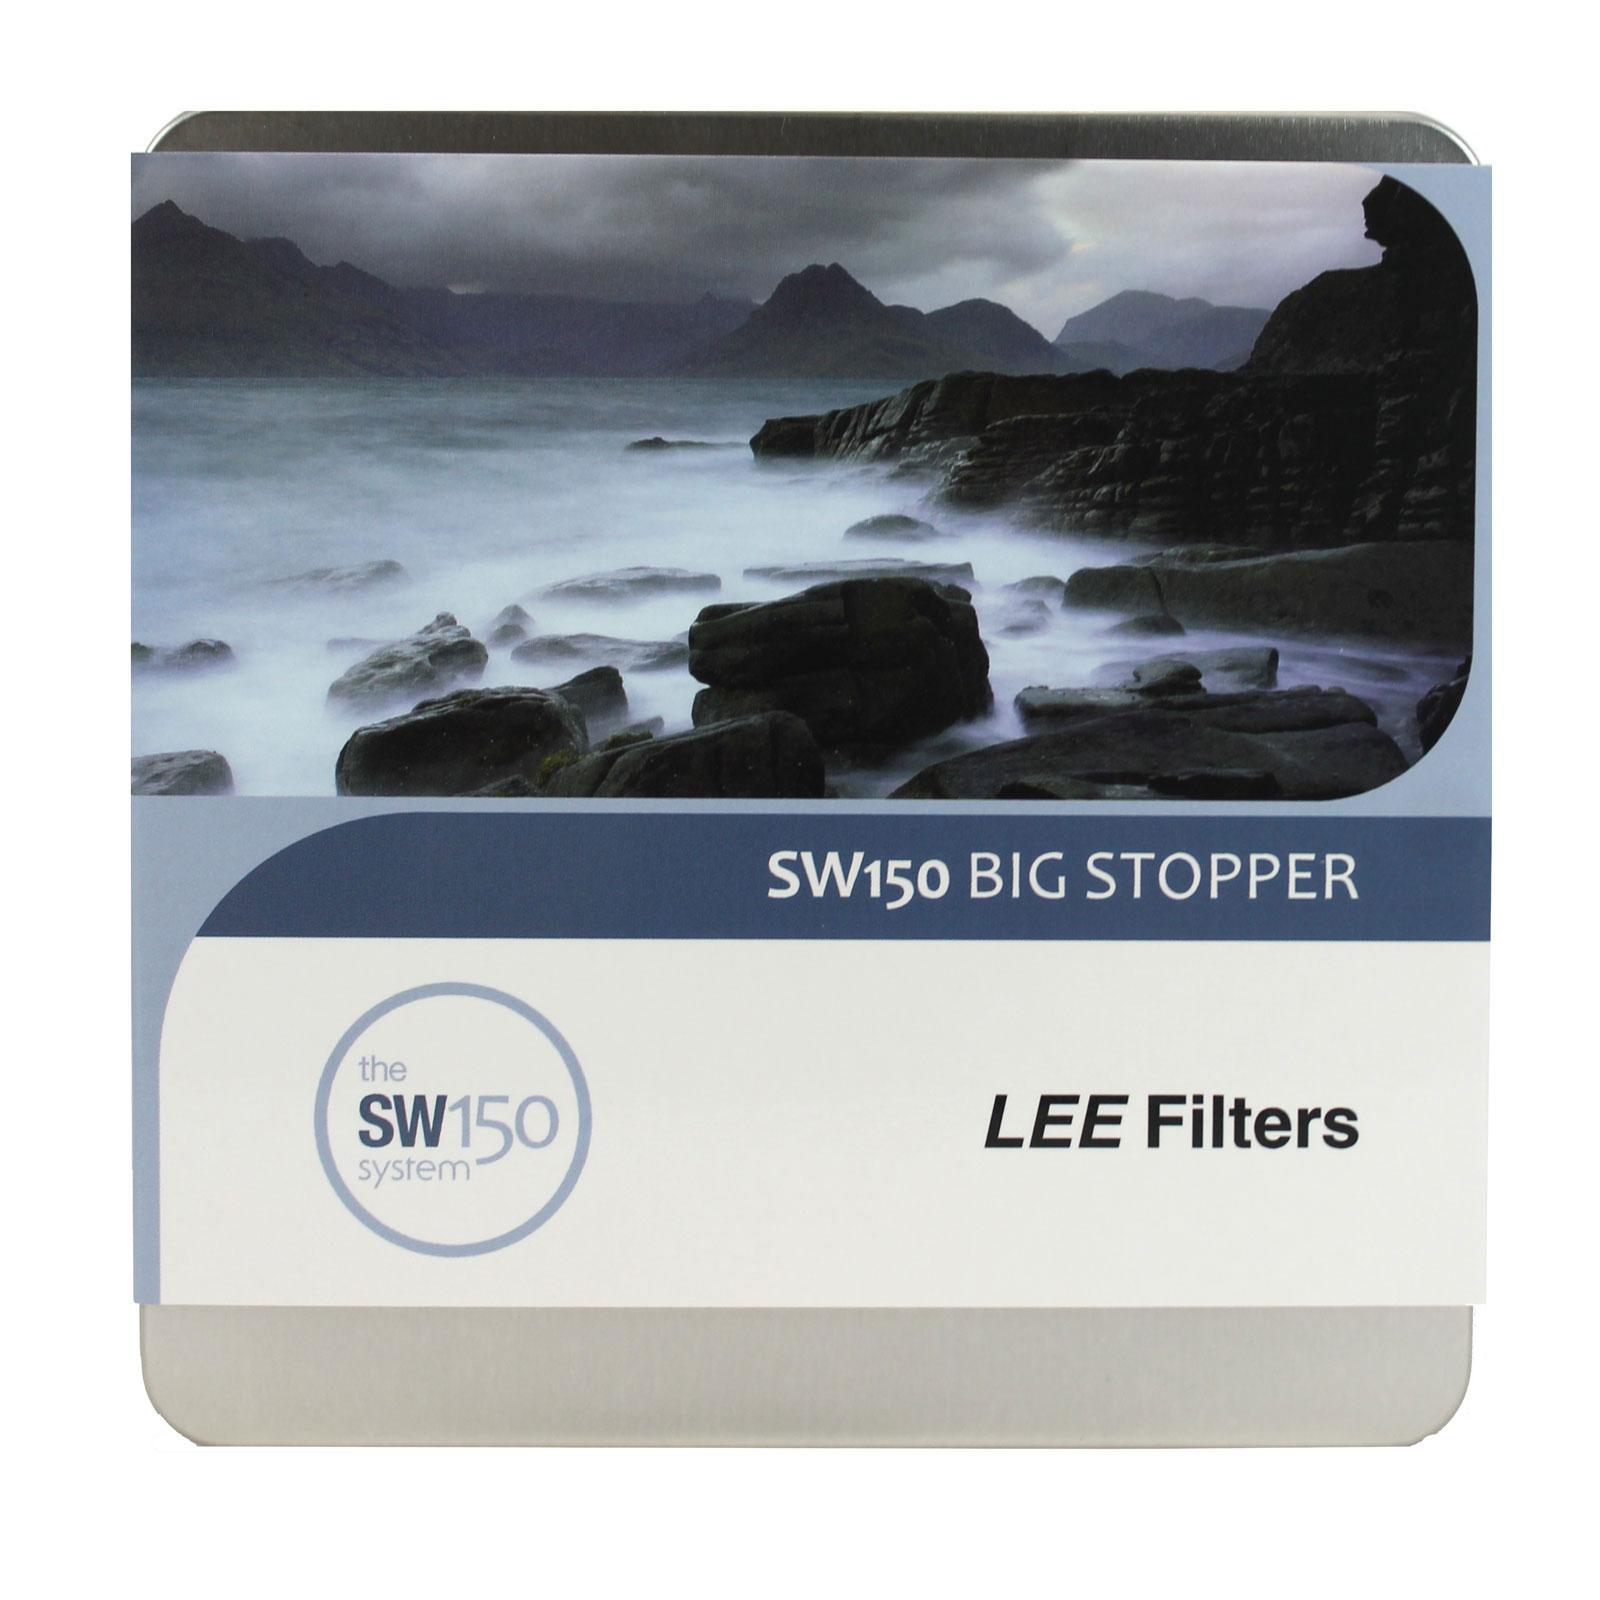 SW150-Big-Stopper-Box